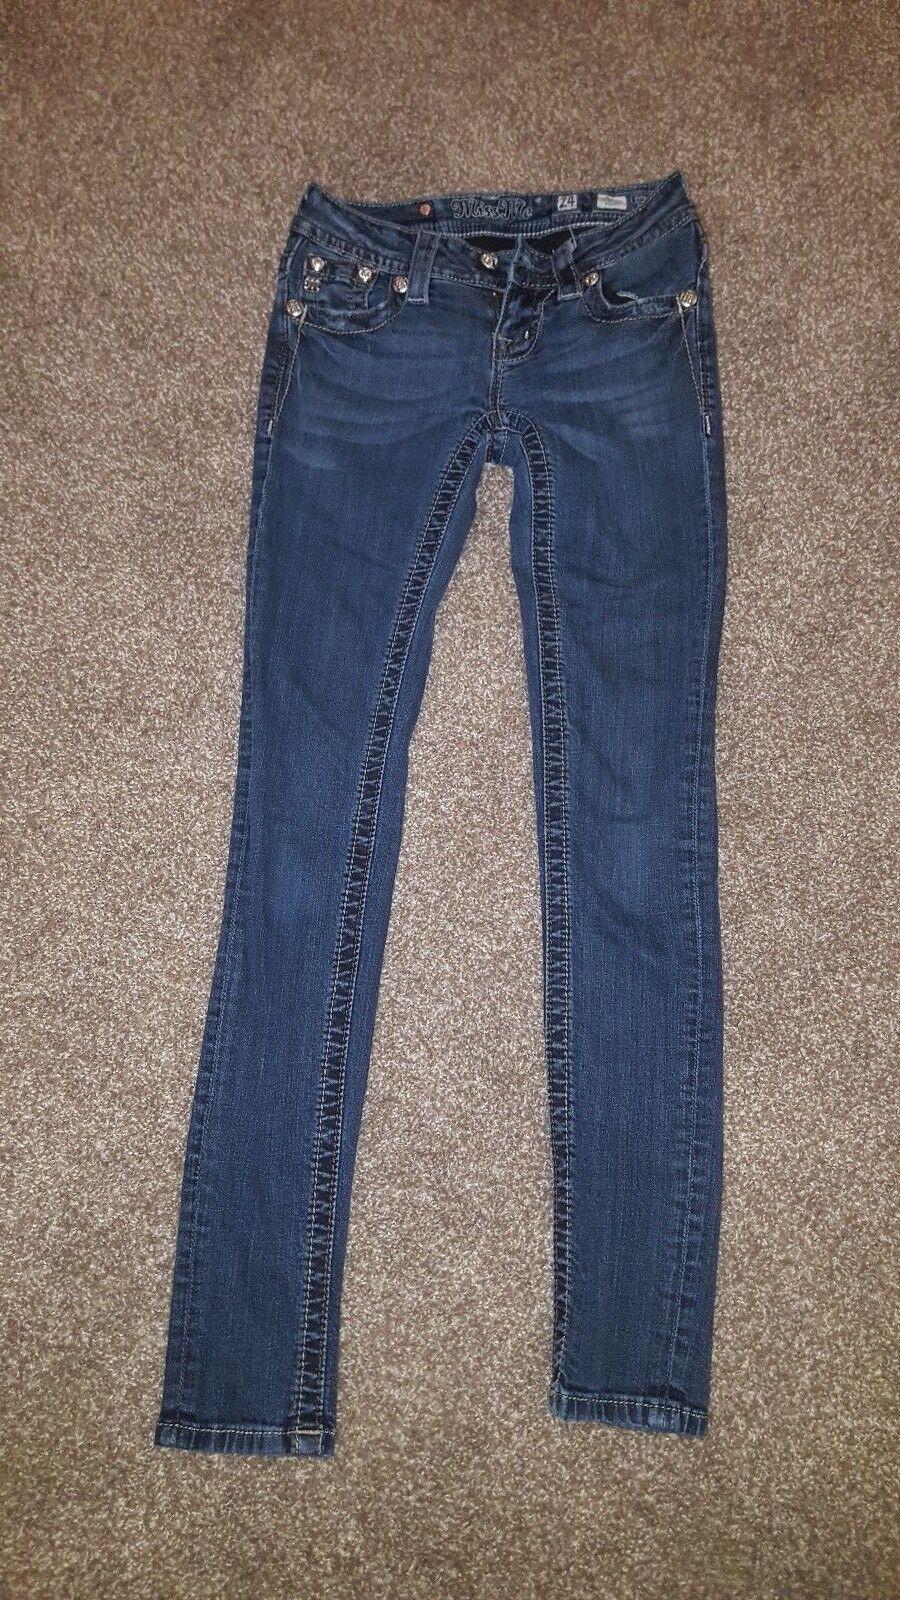 Miss Me Skinny Jeans size 24x29